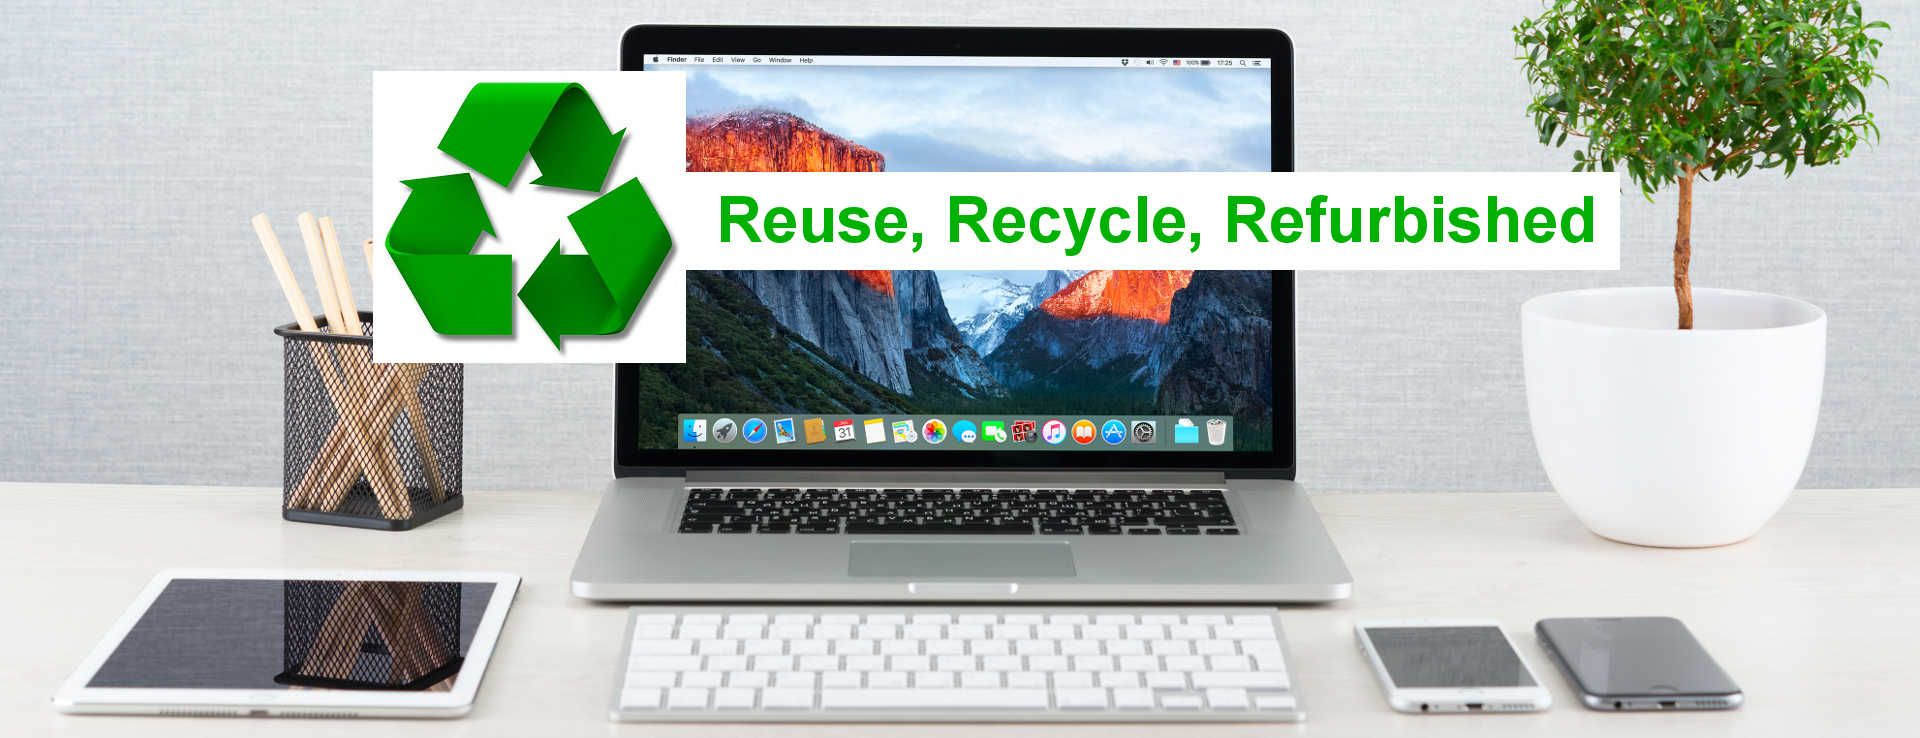 Gainsaver refurbished mac laptops and desktops help